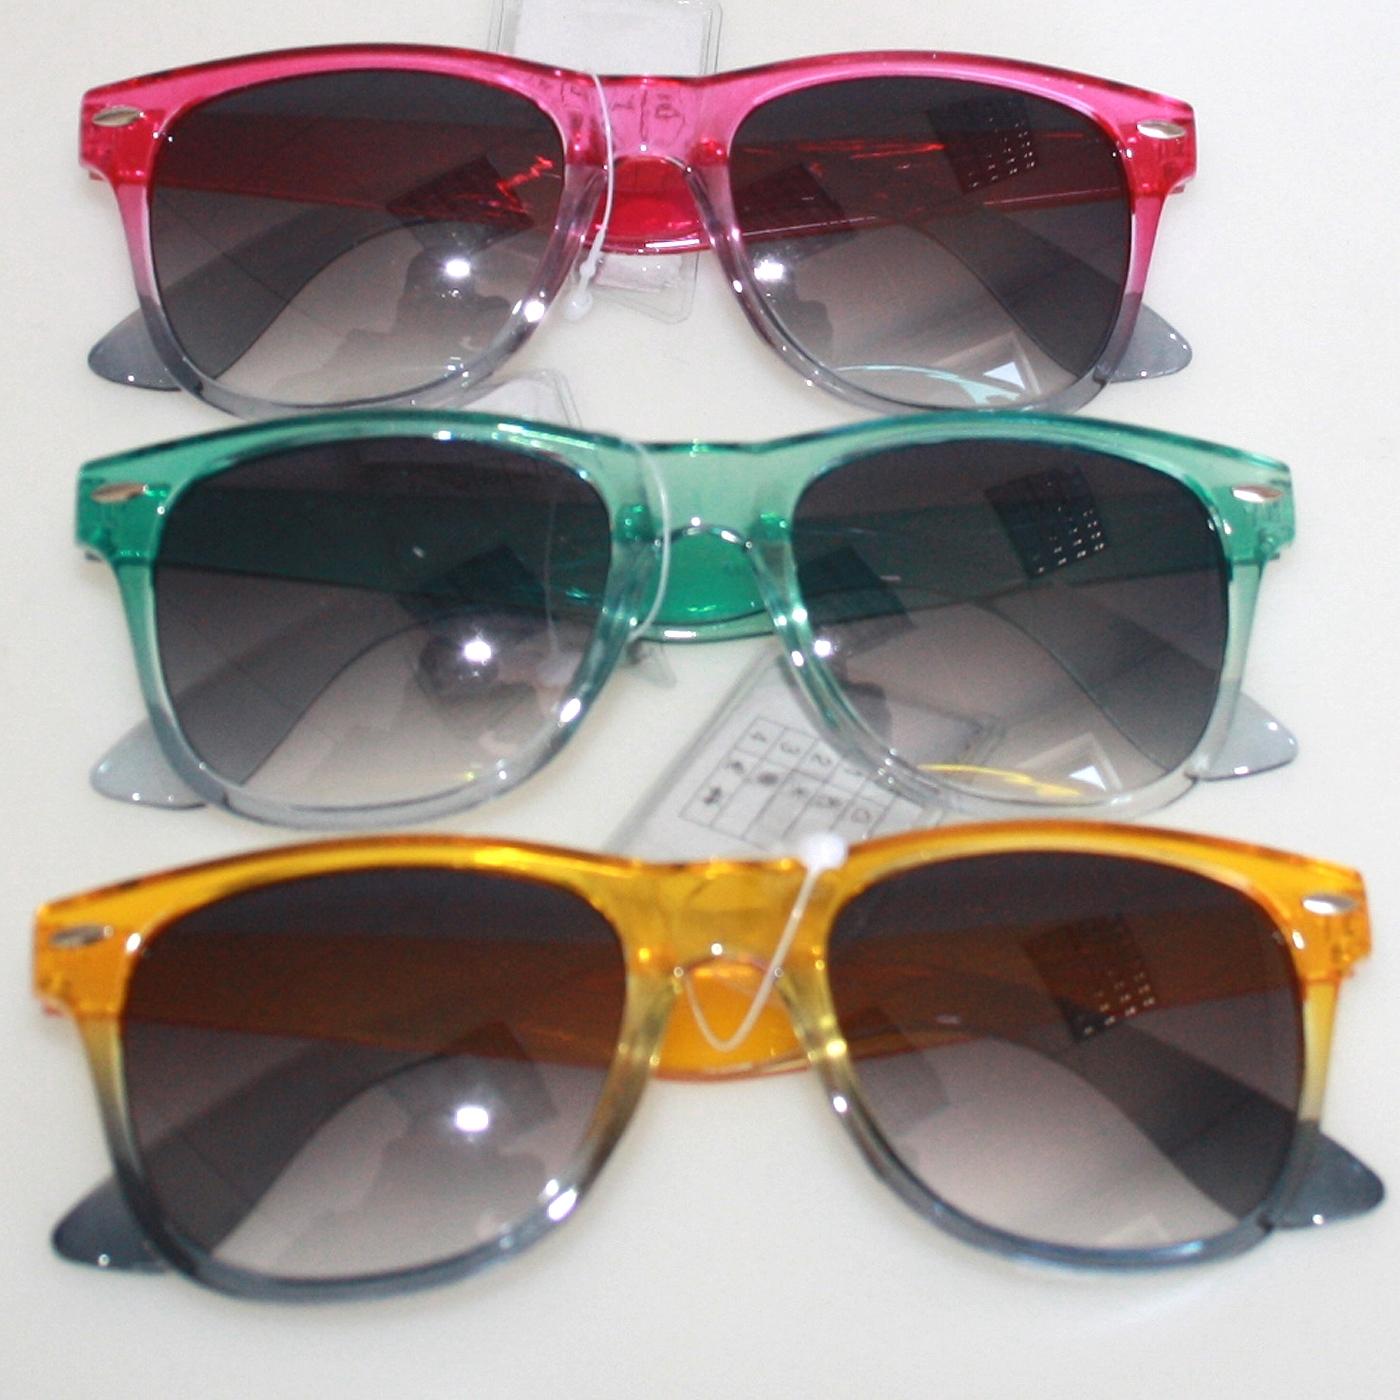 Sunglasses frame 2 color tones, Ray Ban style (A40213) Sunglasses ...